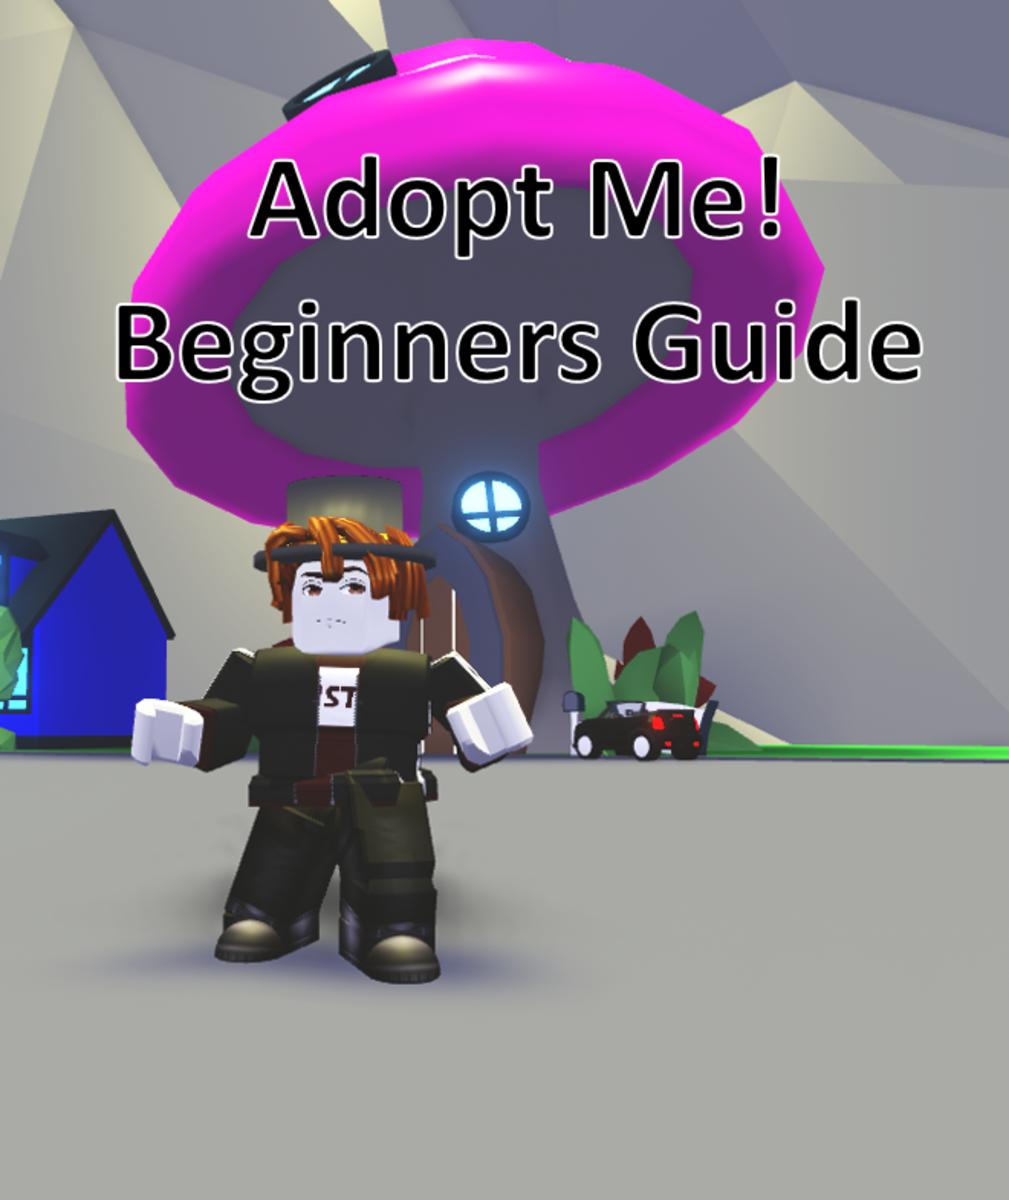 roblox-adopt-me-beginners-guide